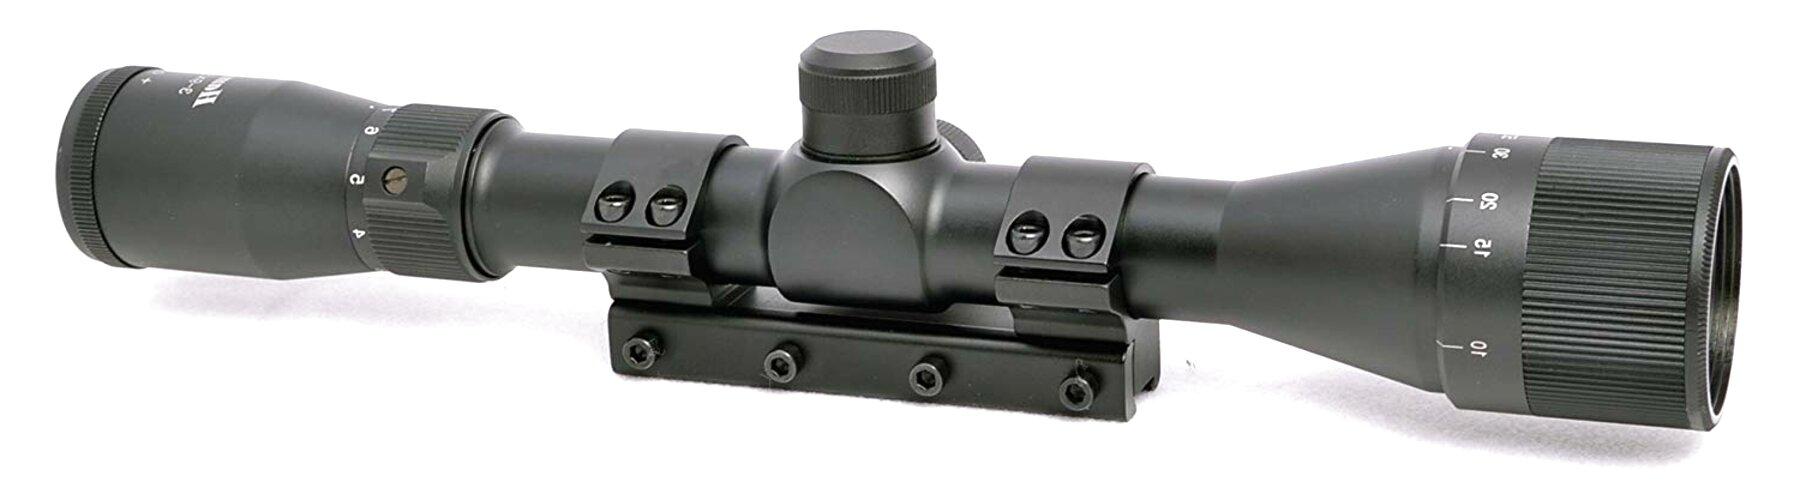 scopes gun largest alerted alert listings scope